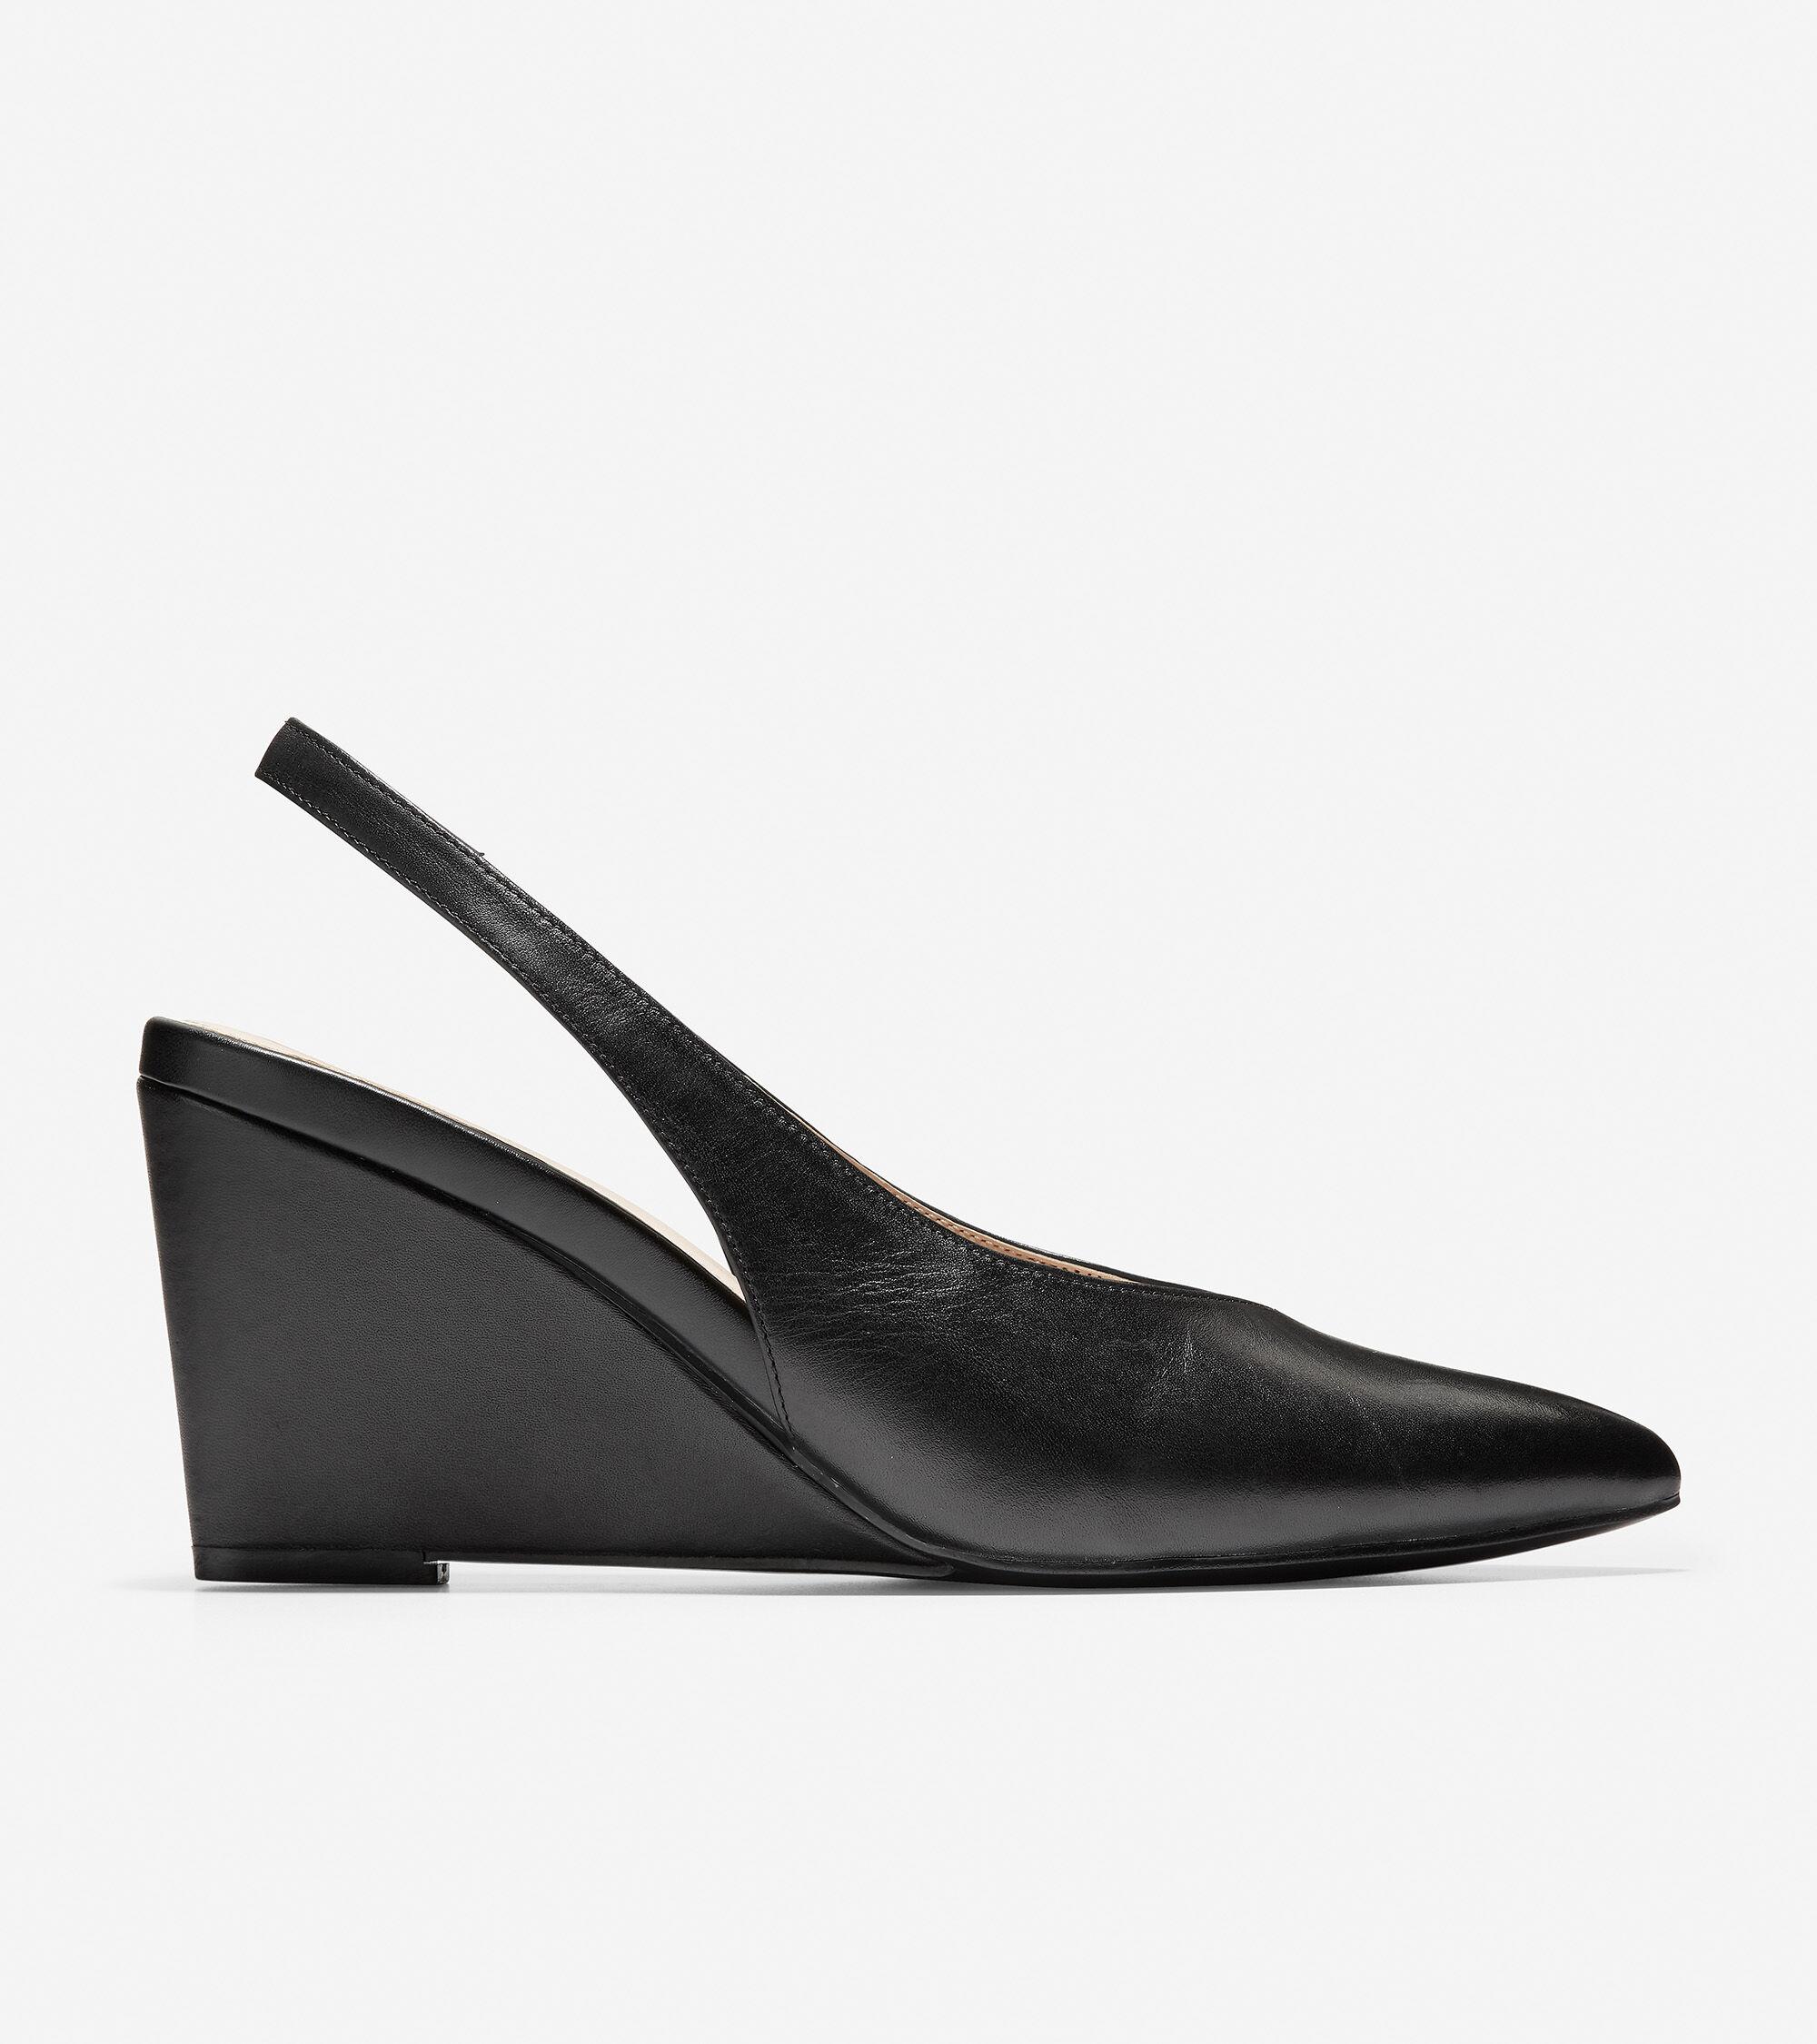 Elnora Slingback Wedge in Black Leather